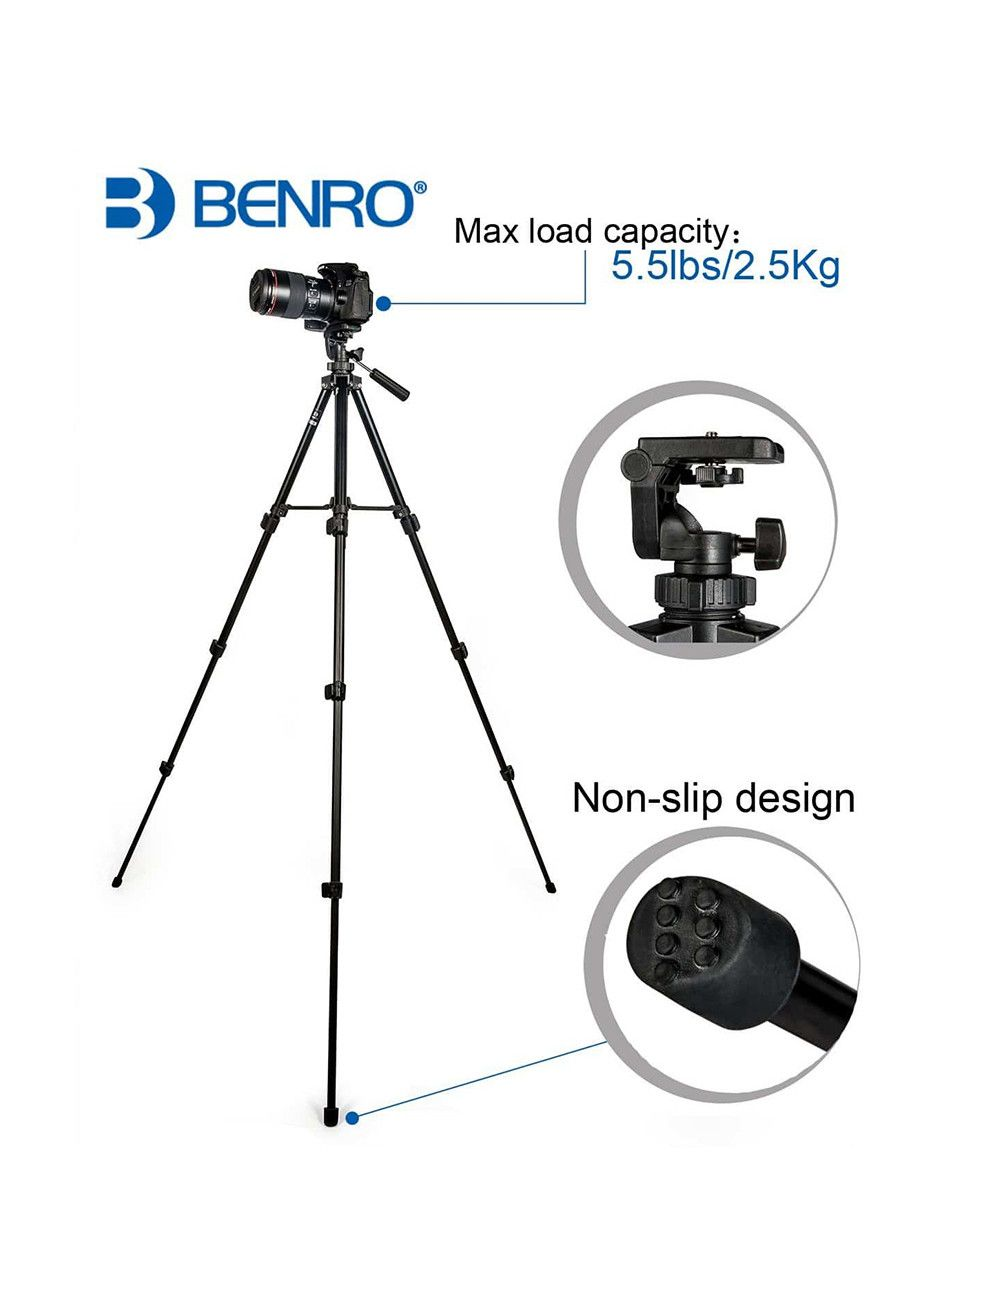 Canon Set de 2 lentes 50mm F1.8 STM + 75-300 F.4-5.6 III Compatibles con cualquier reflex canon